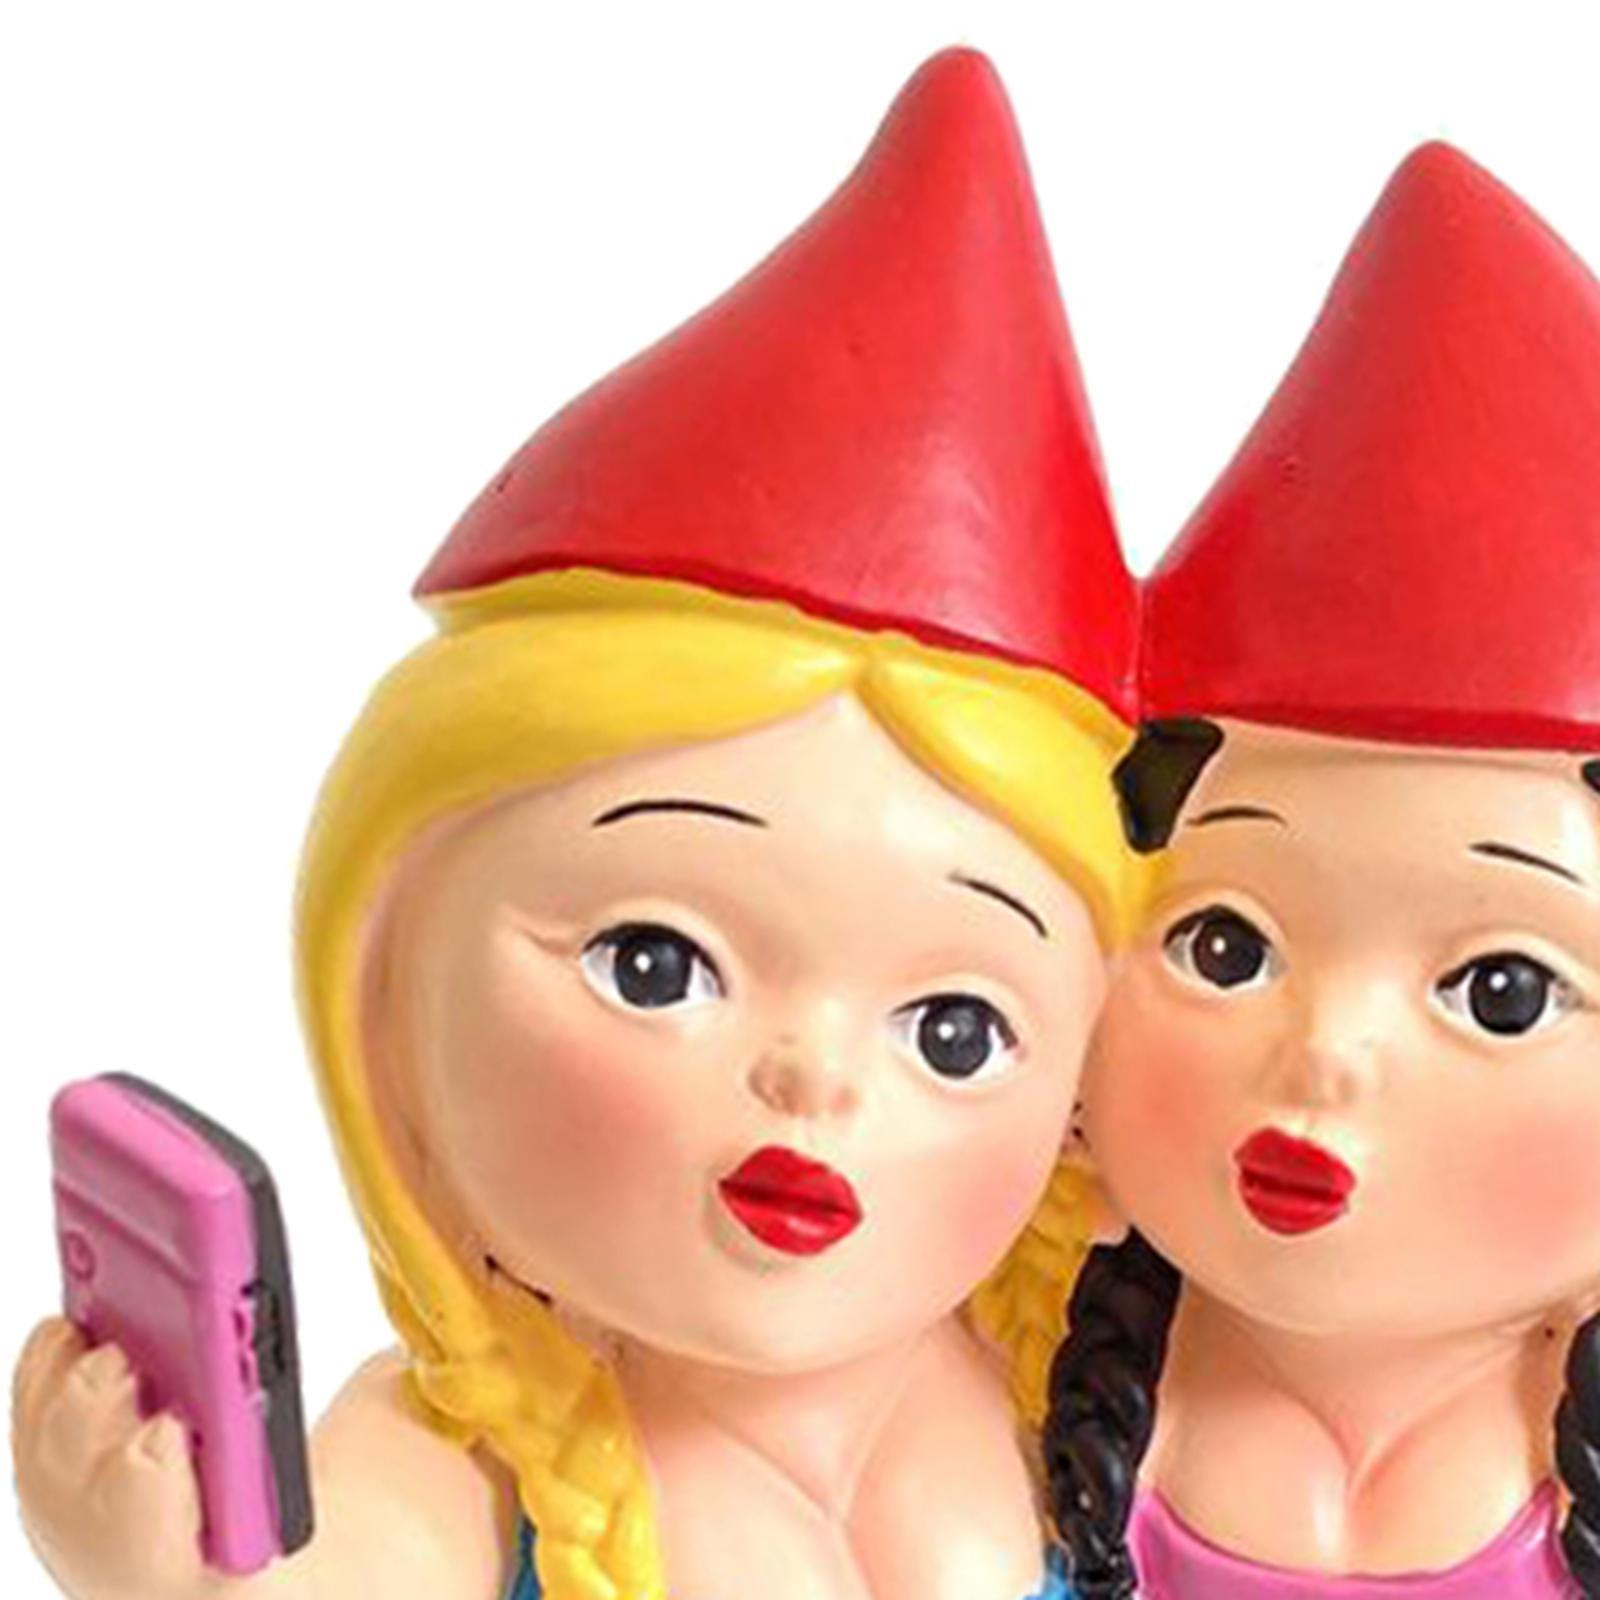 thumbnail 15 - Funny Resin Naughty Garden Gnome Statue Ornaments Villa Home Figurines Decor AU